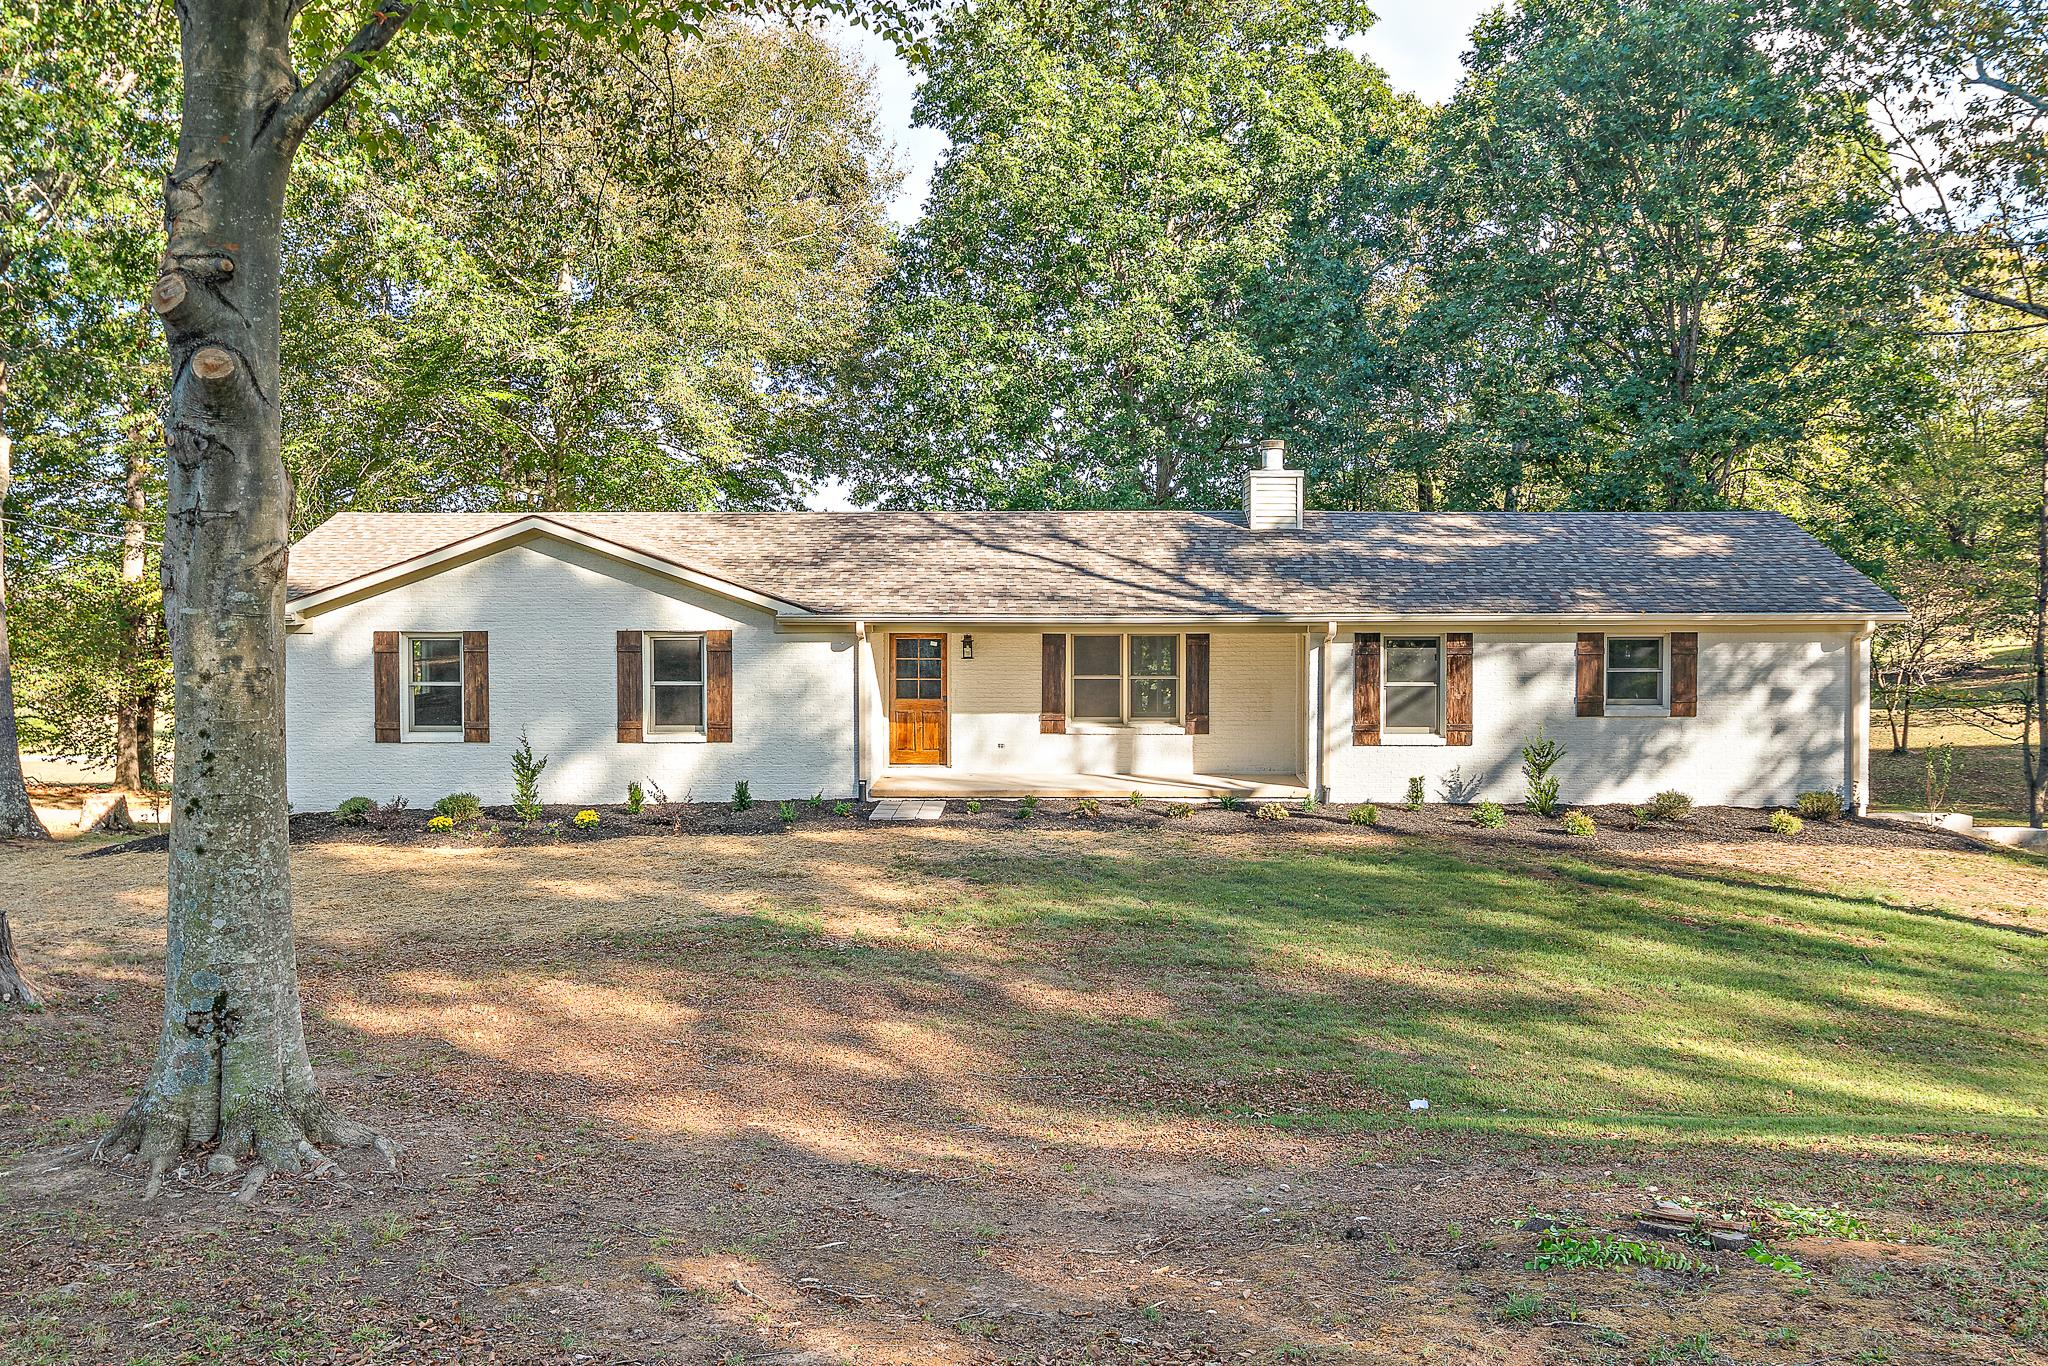 384 Peach Ave, Morrison, TN 37357 - Morrison, TN real estate listing